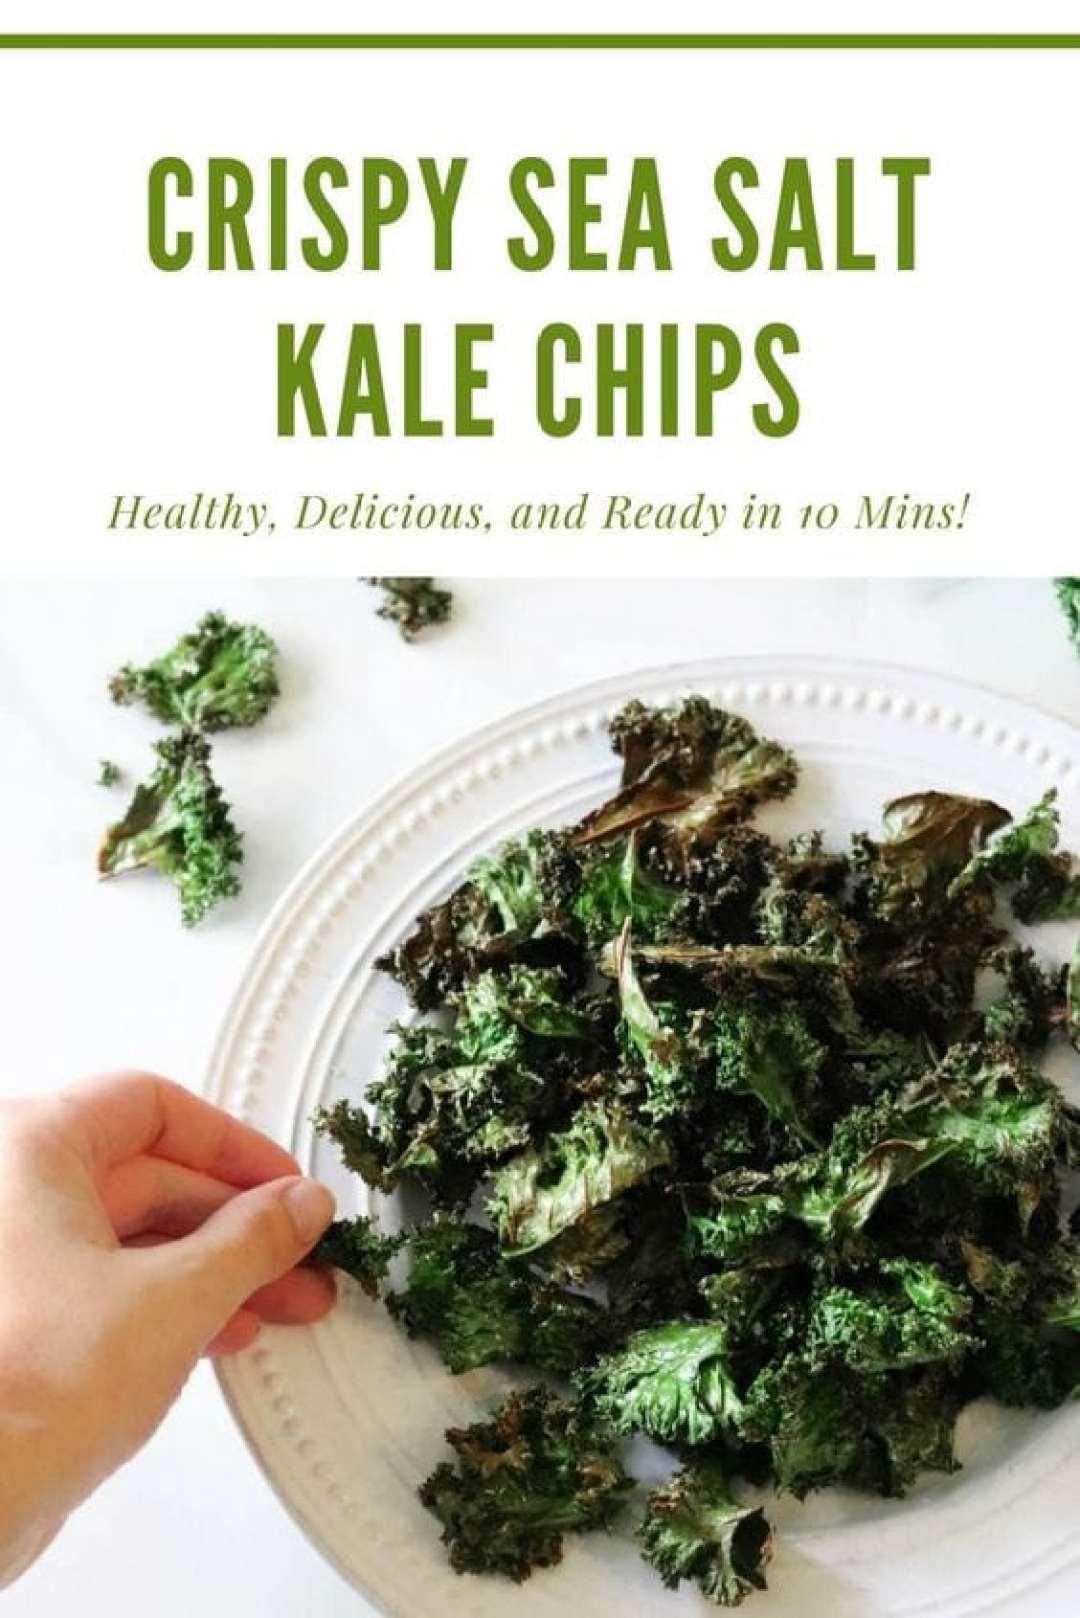 Crispy Sea Salt Kale Chip